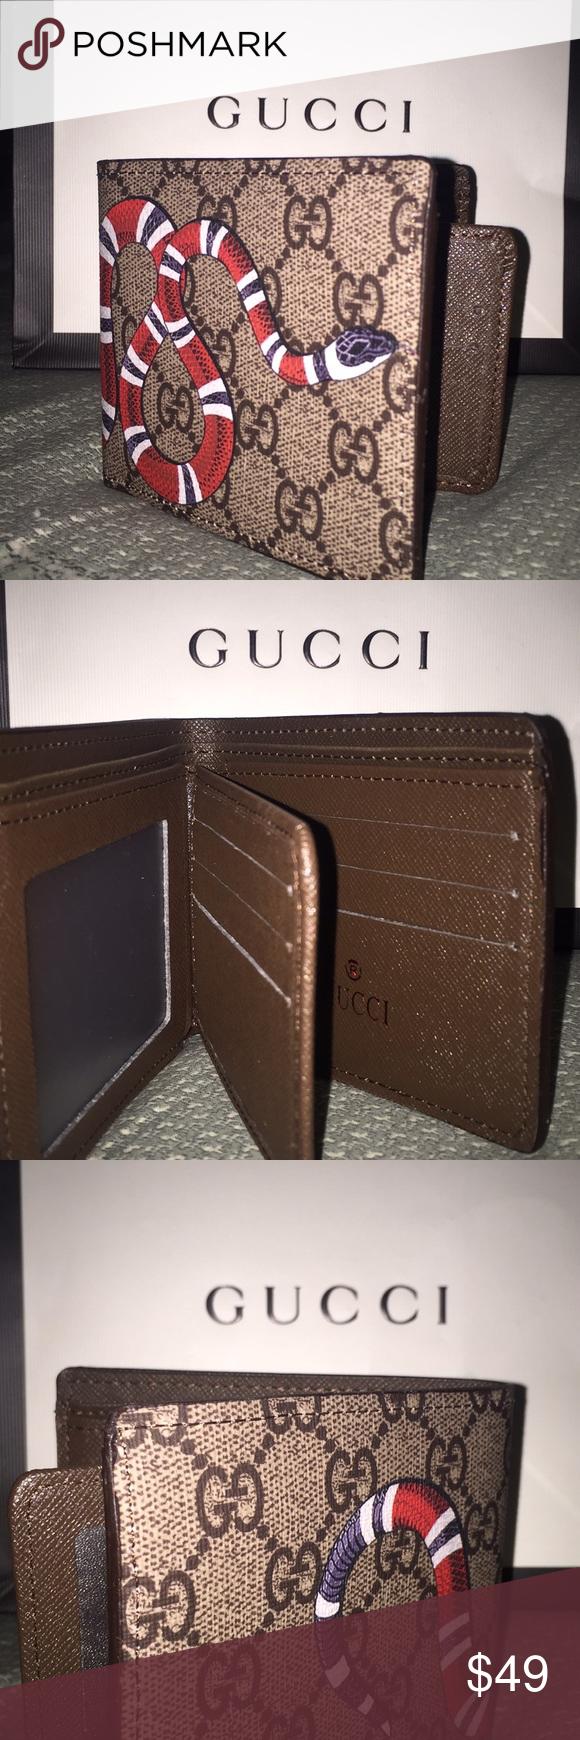 1ea23b9784183b Gucci wallet snake logo 🐍 Gucci wallet snake logo, very fashionable Gucci  Bags Wallets